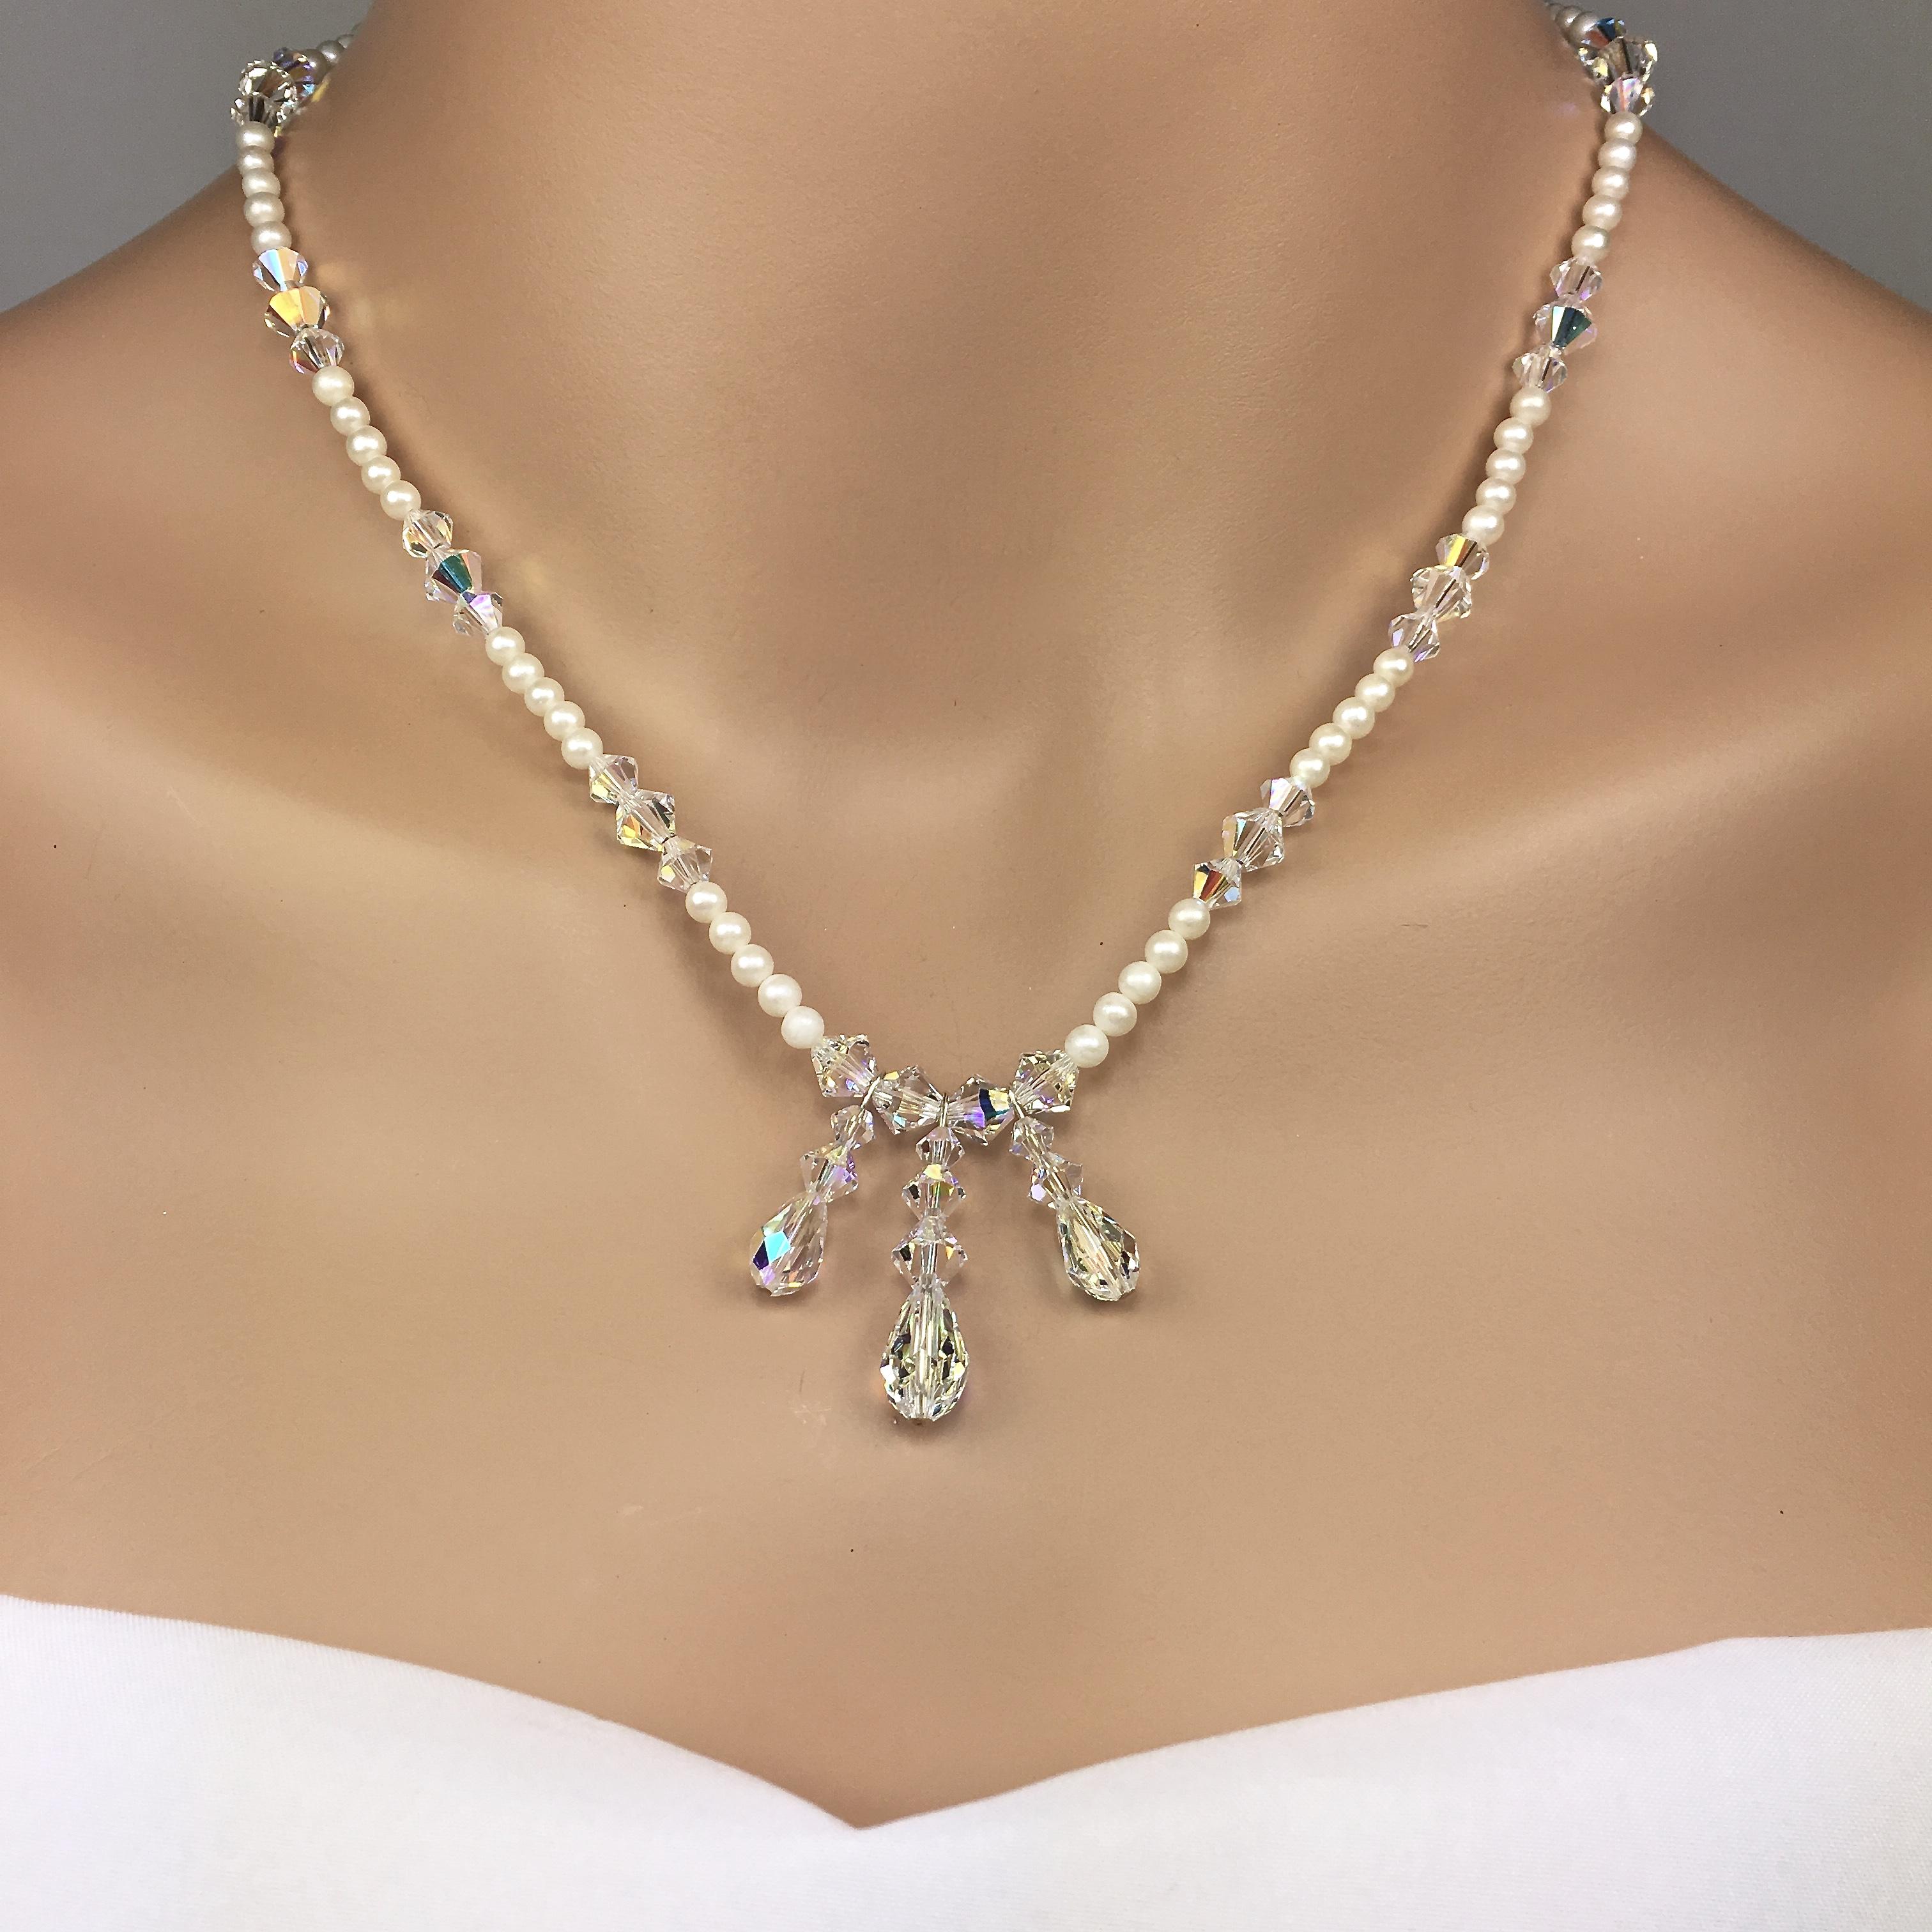 Pearl and Swarovski Crystal Pendant Bridal Necklace Set